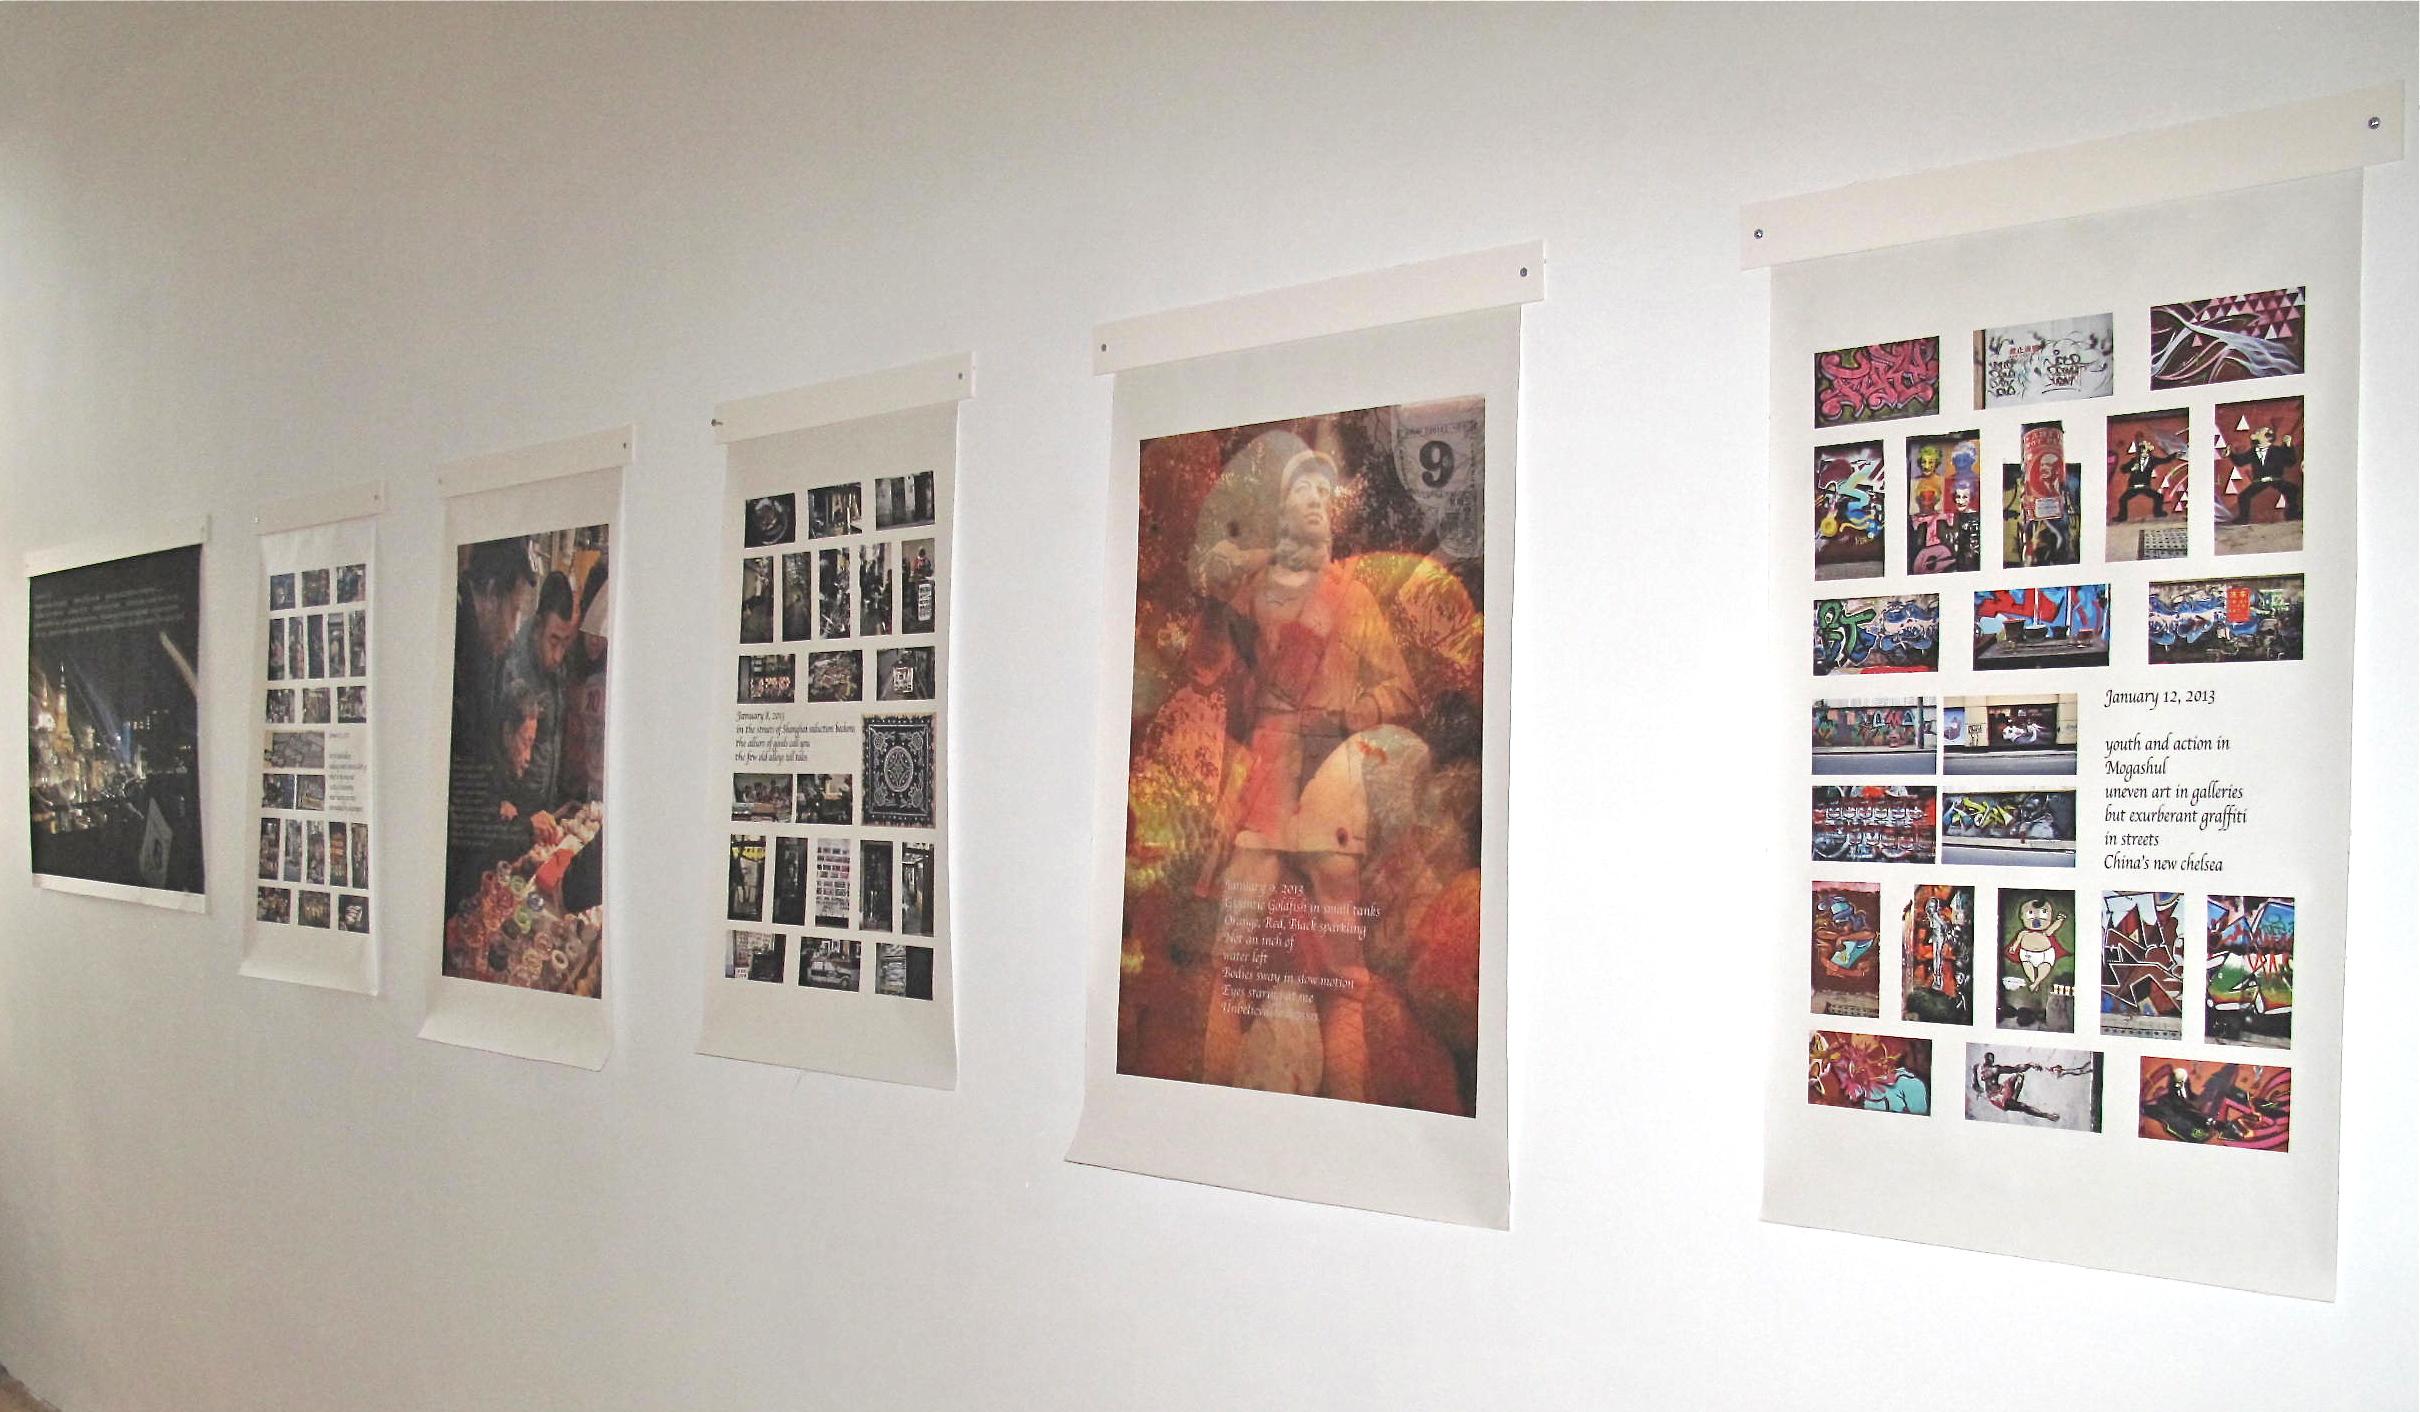 Sara Petitt, On the Wall Installation 2